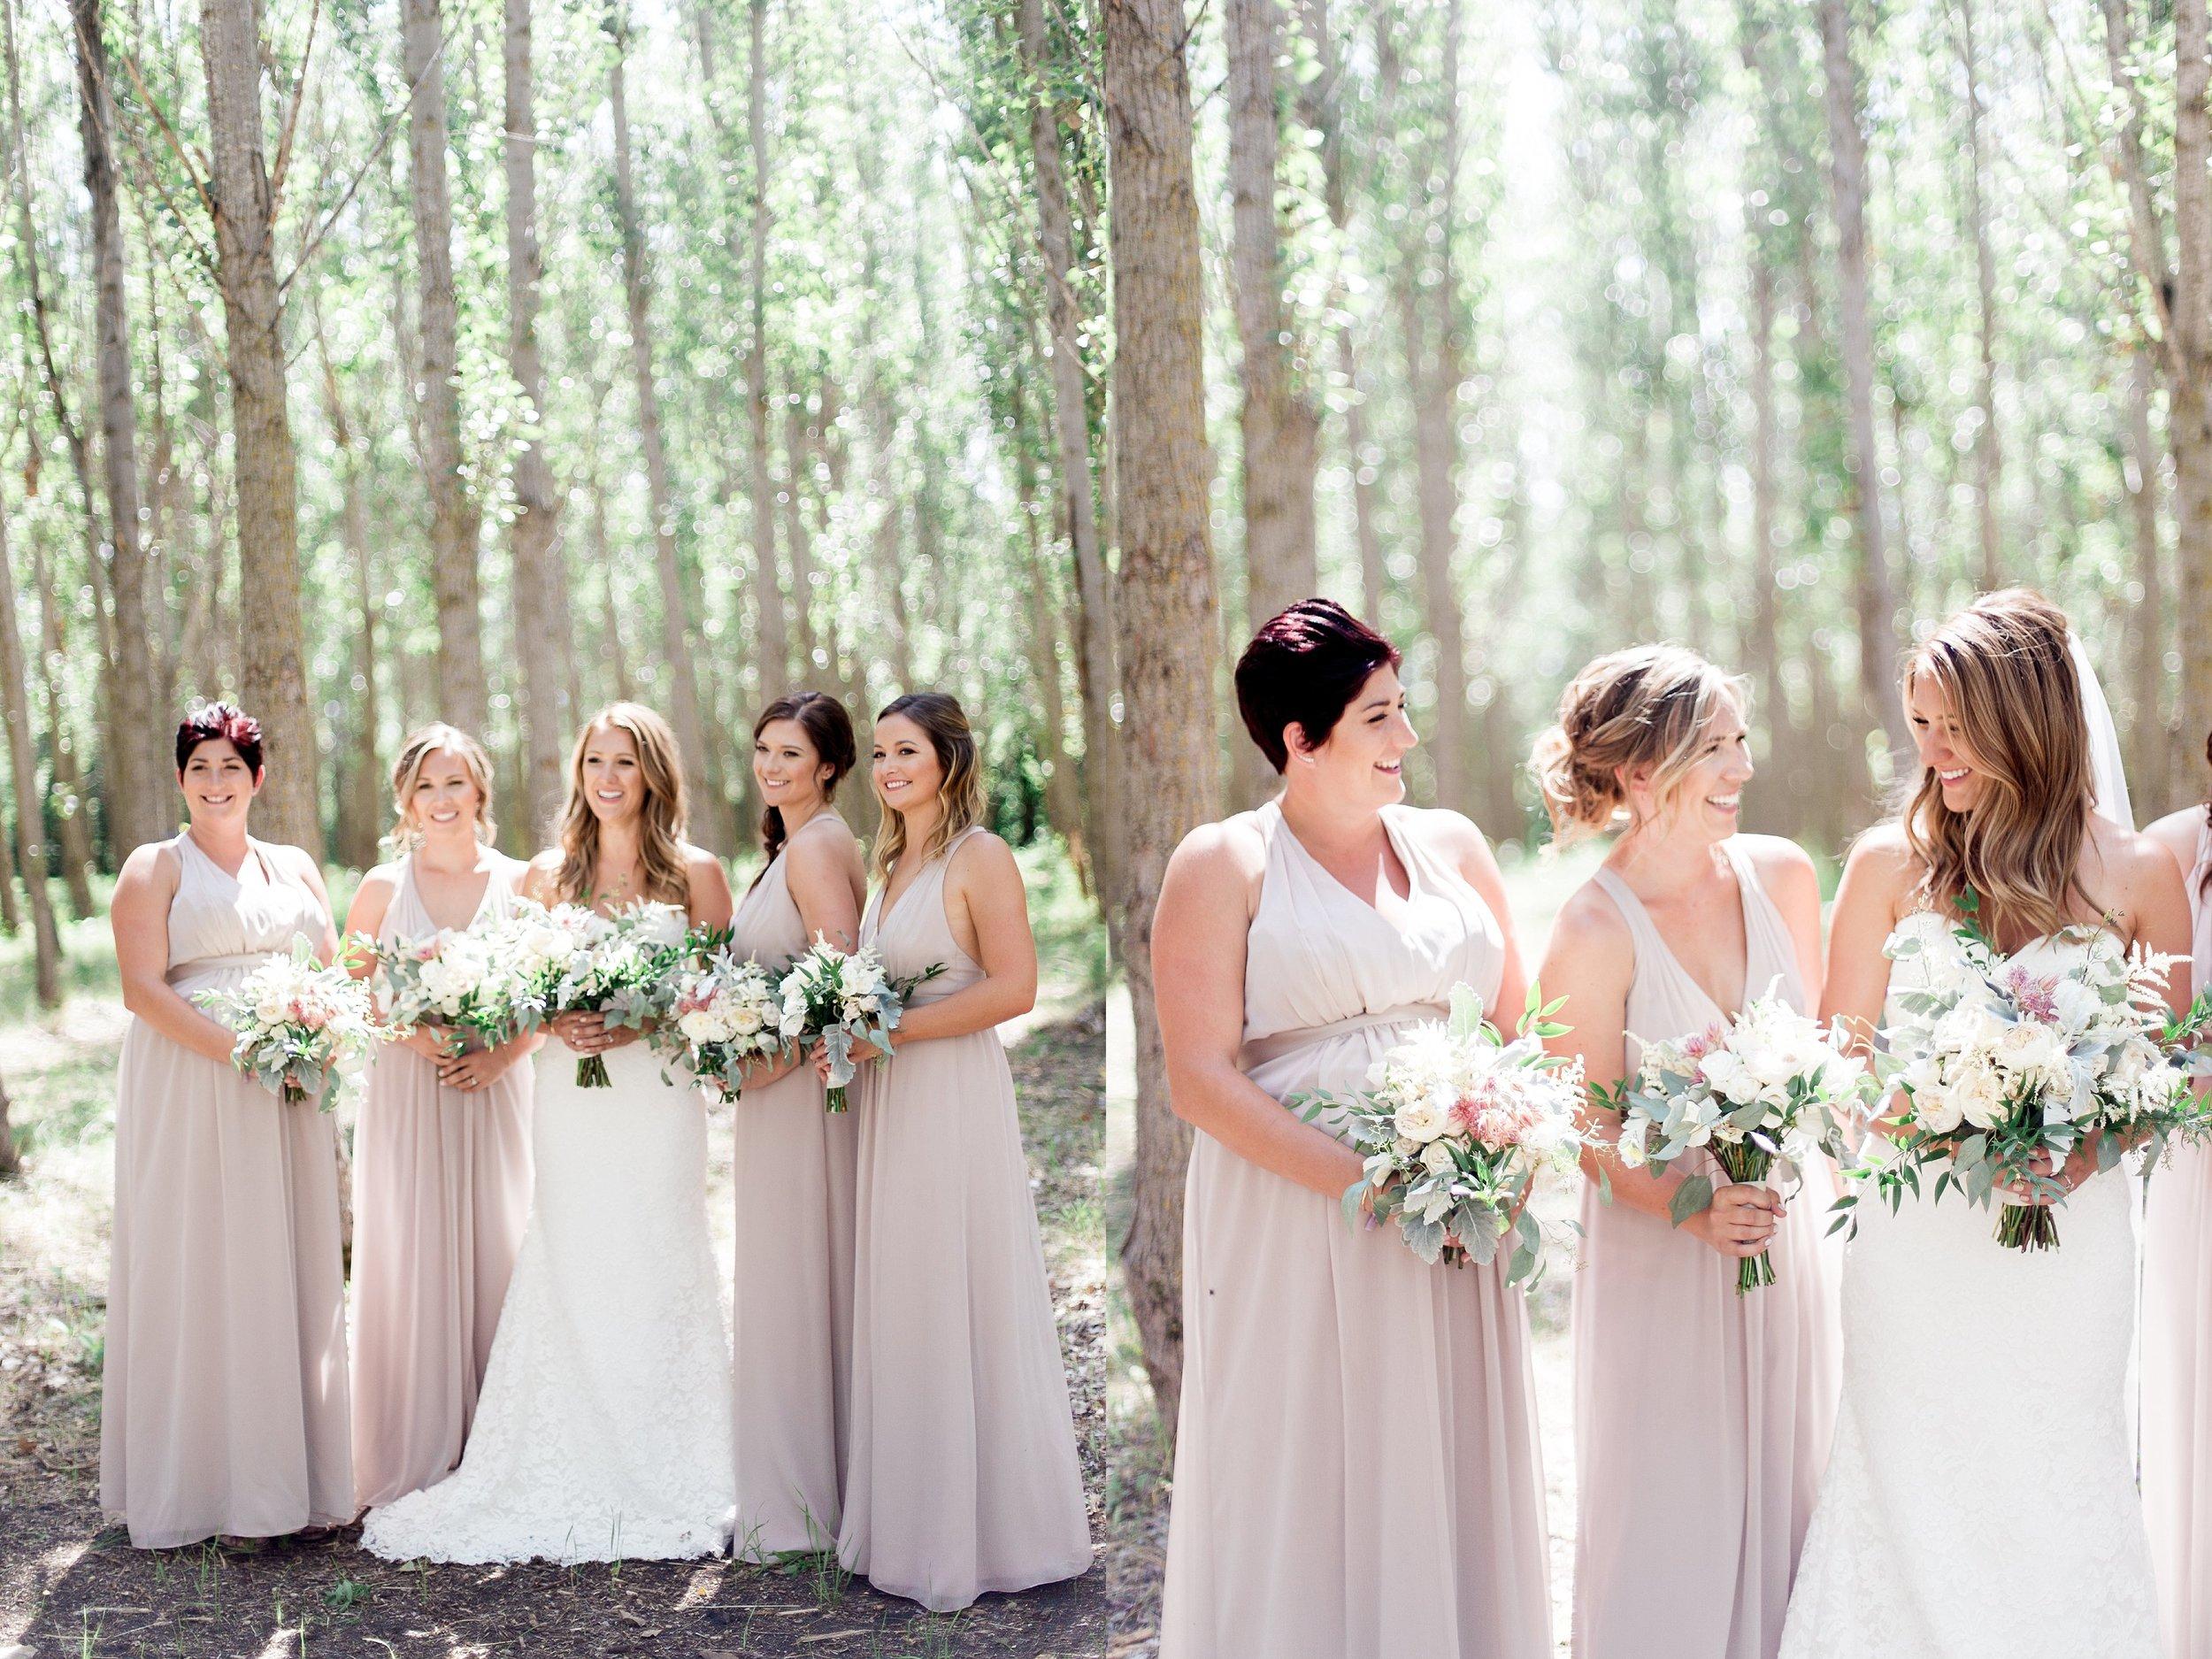 Vancouver Wedding Photographer film photographer Keila Marie Photography   Bridesmaids photos   bridesmaid blush dresses